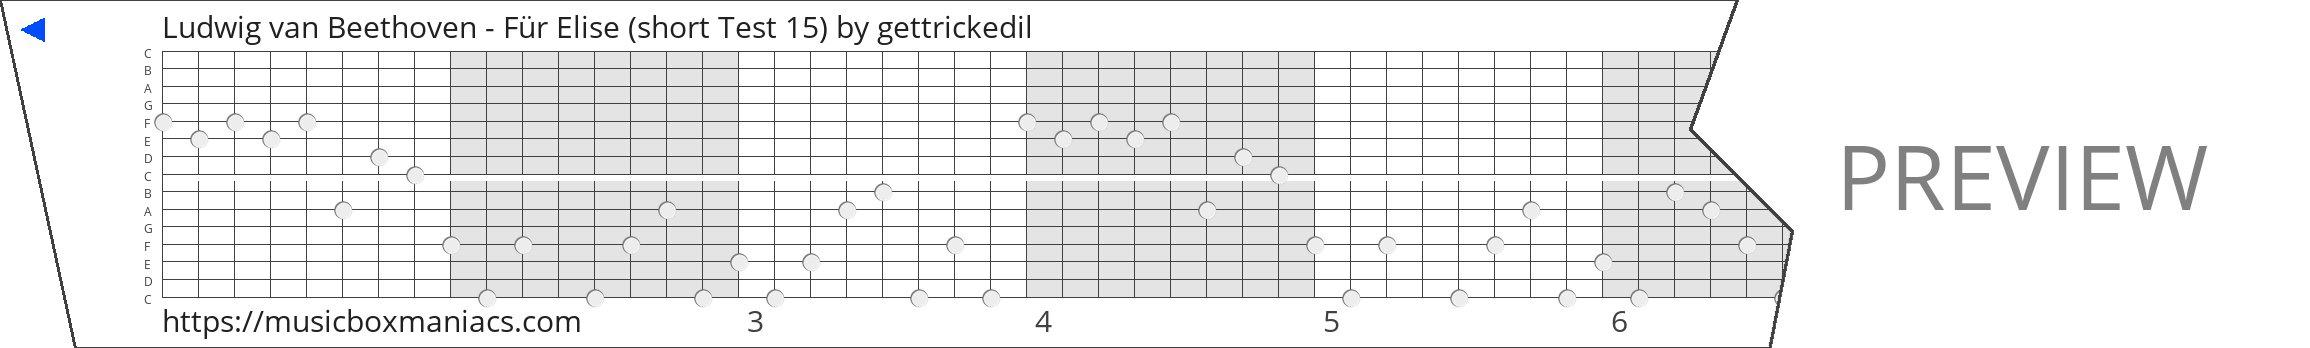 Ludwig van Beethoven - Für Elise (short Test 15) 15 note music box paper strip